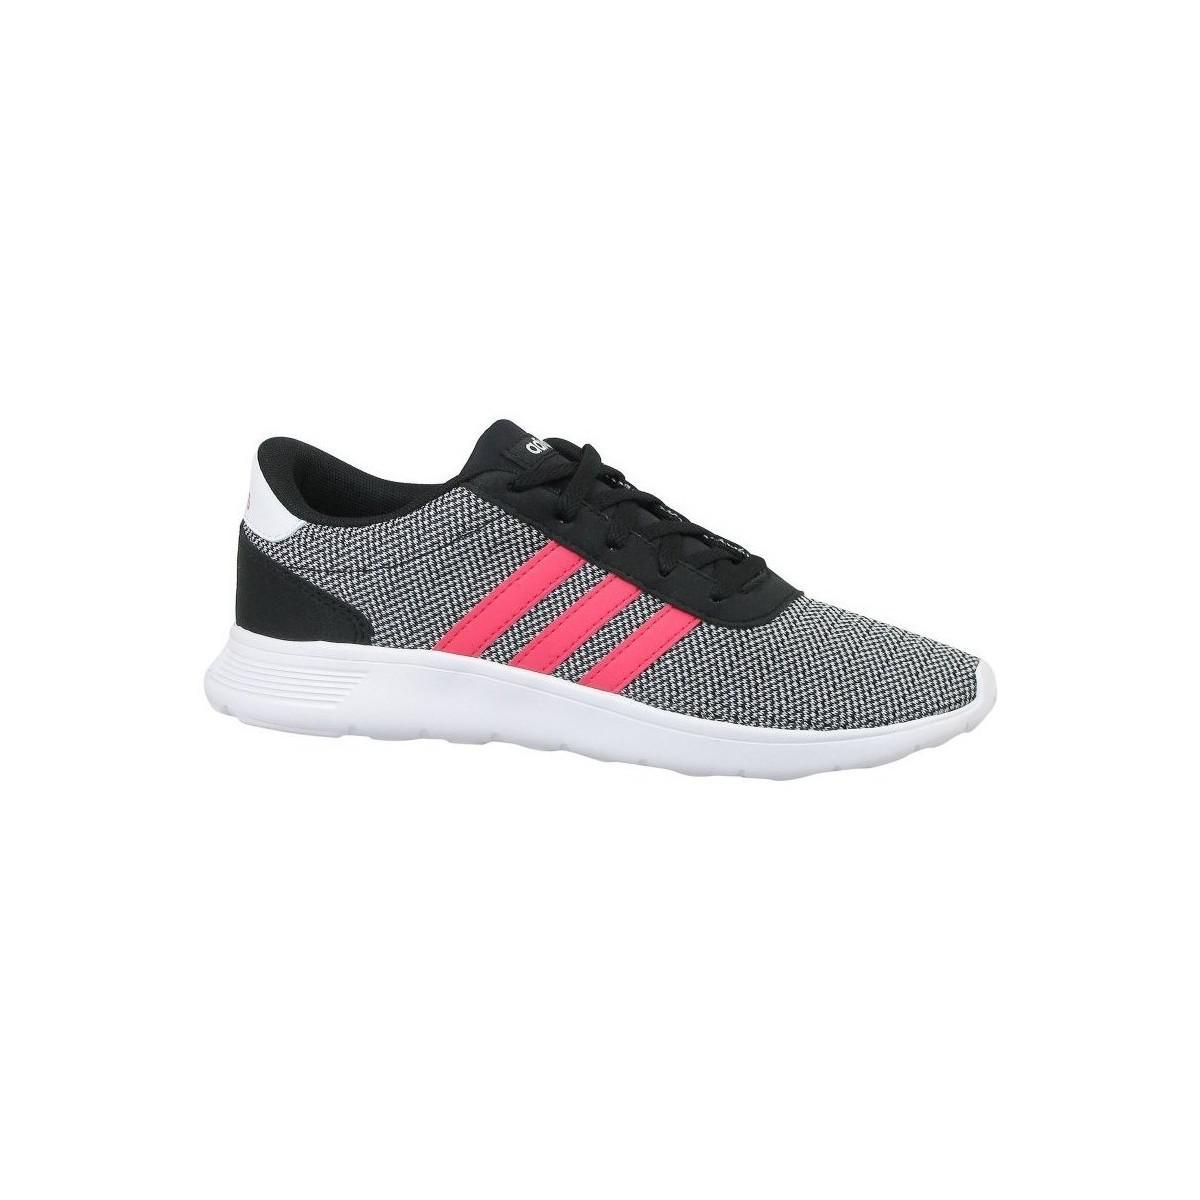 adidas Neo Lite Racer Aw5045 Footwear Grey, Men's Low top